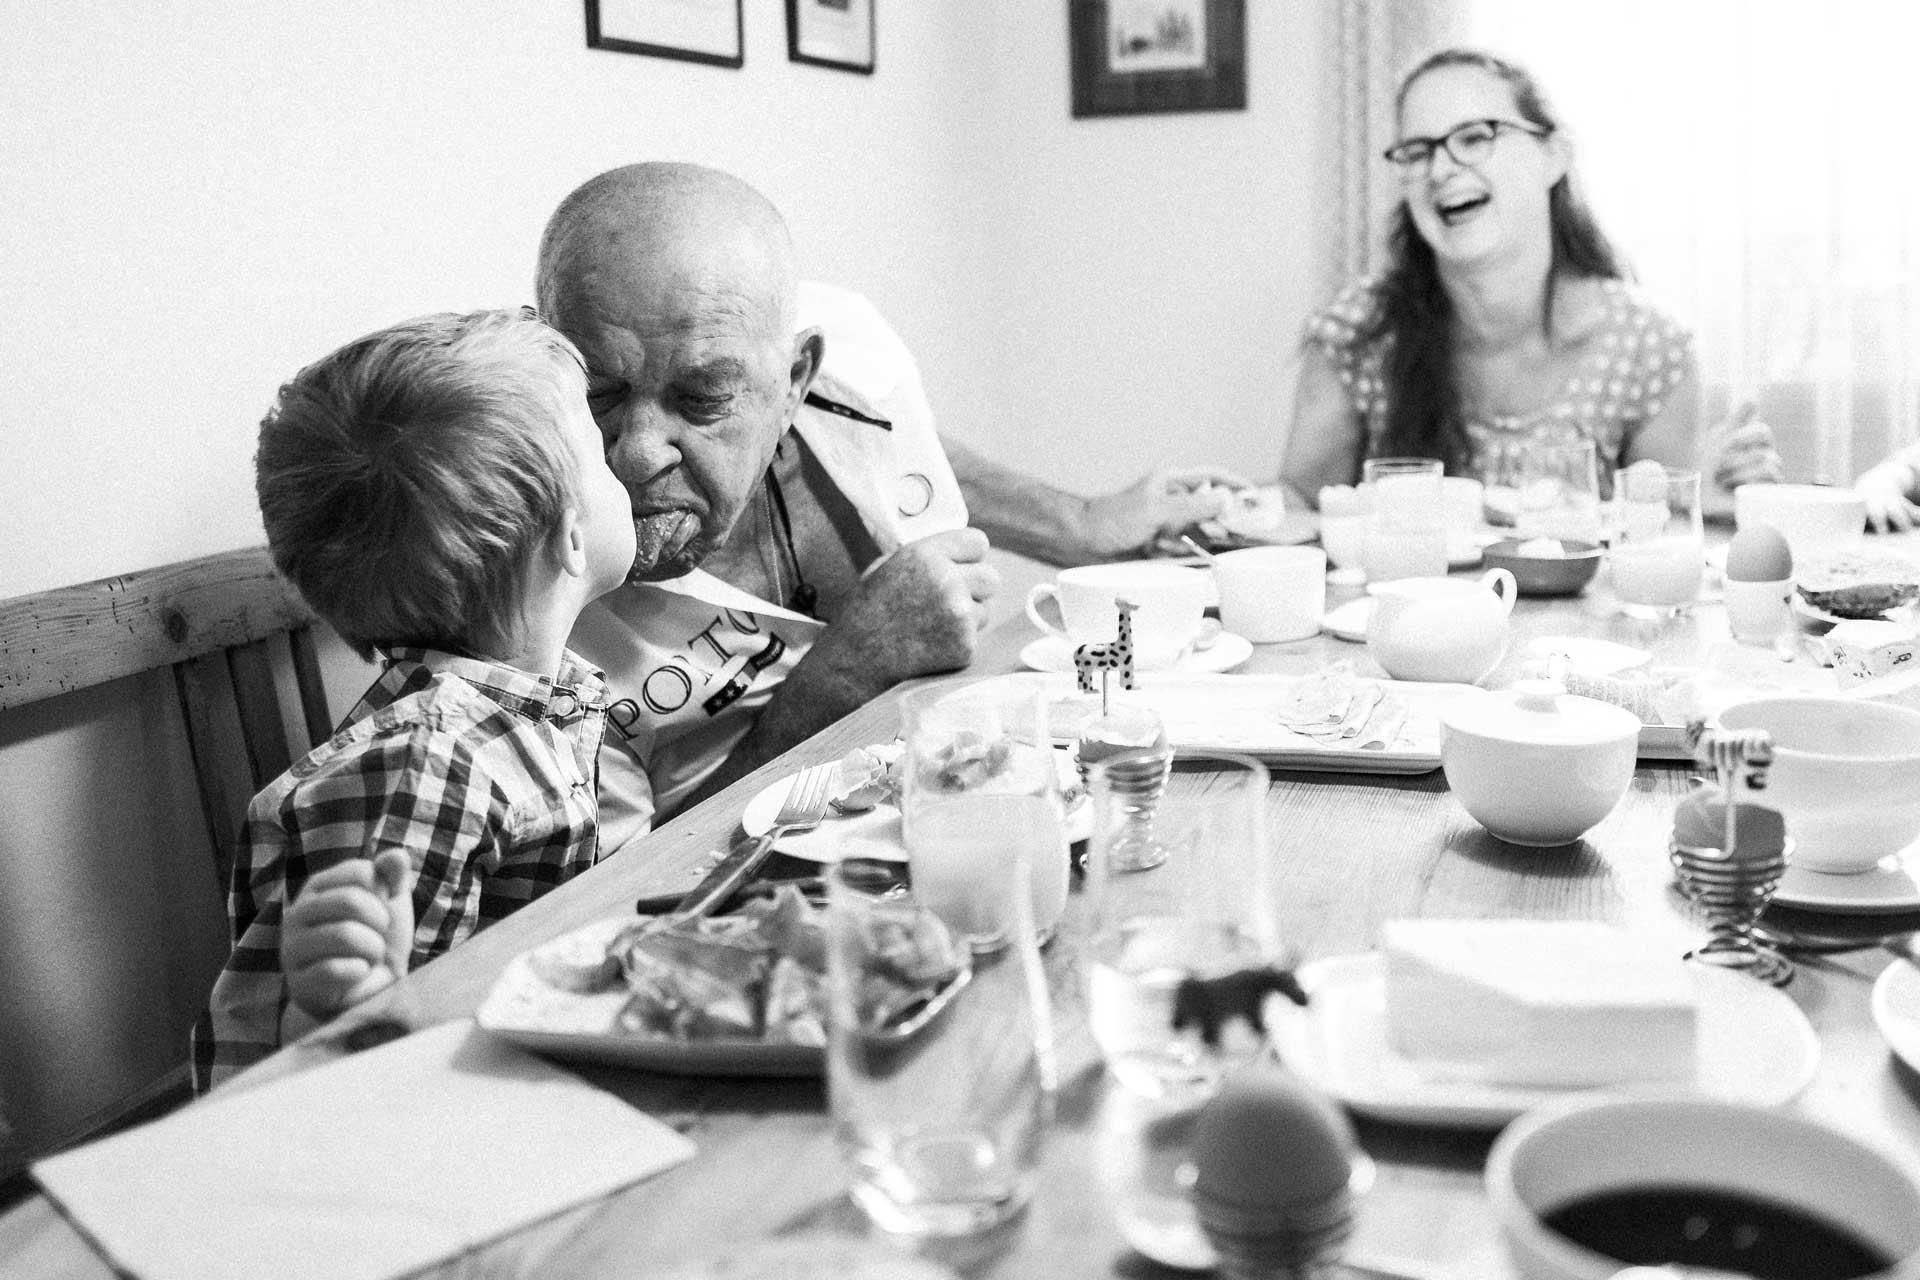 Familie-Rockinger-Juni-2017-28.jpg